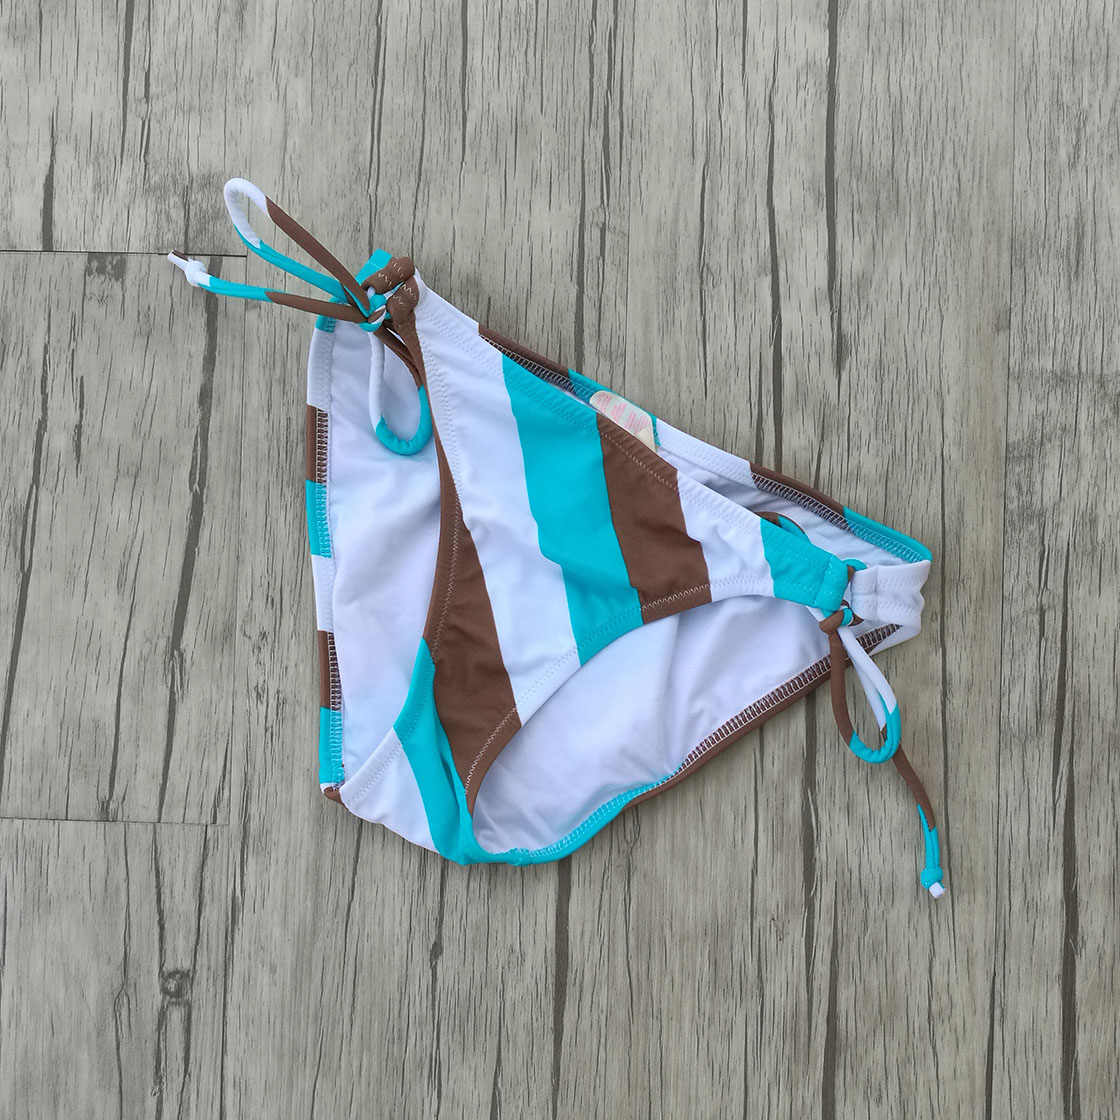 Femmes Triangle bleu rayures Bikini Maillot De Bain brésilien Push Up Maillot De Bain sexy fille Secret Maillot De Bain